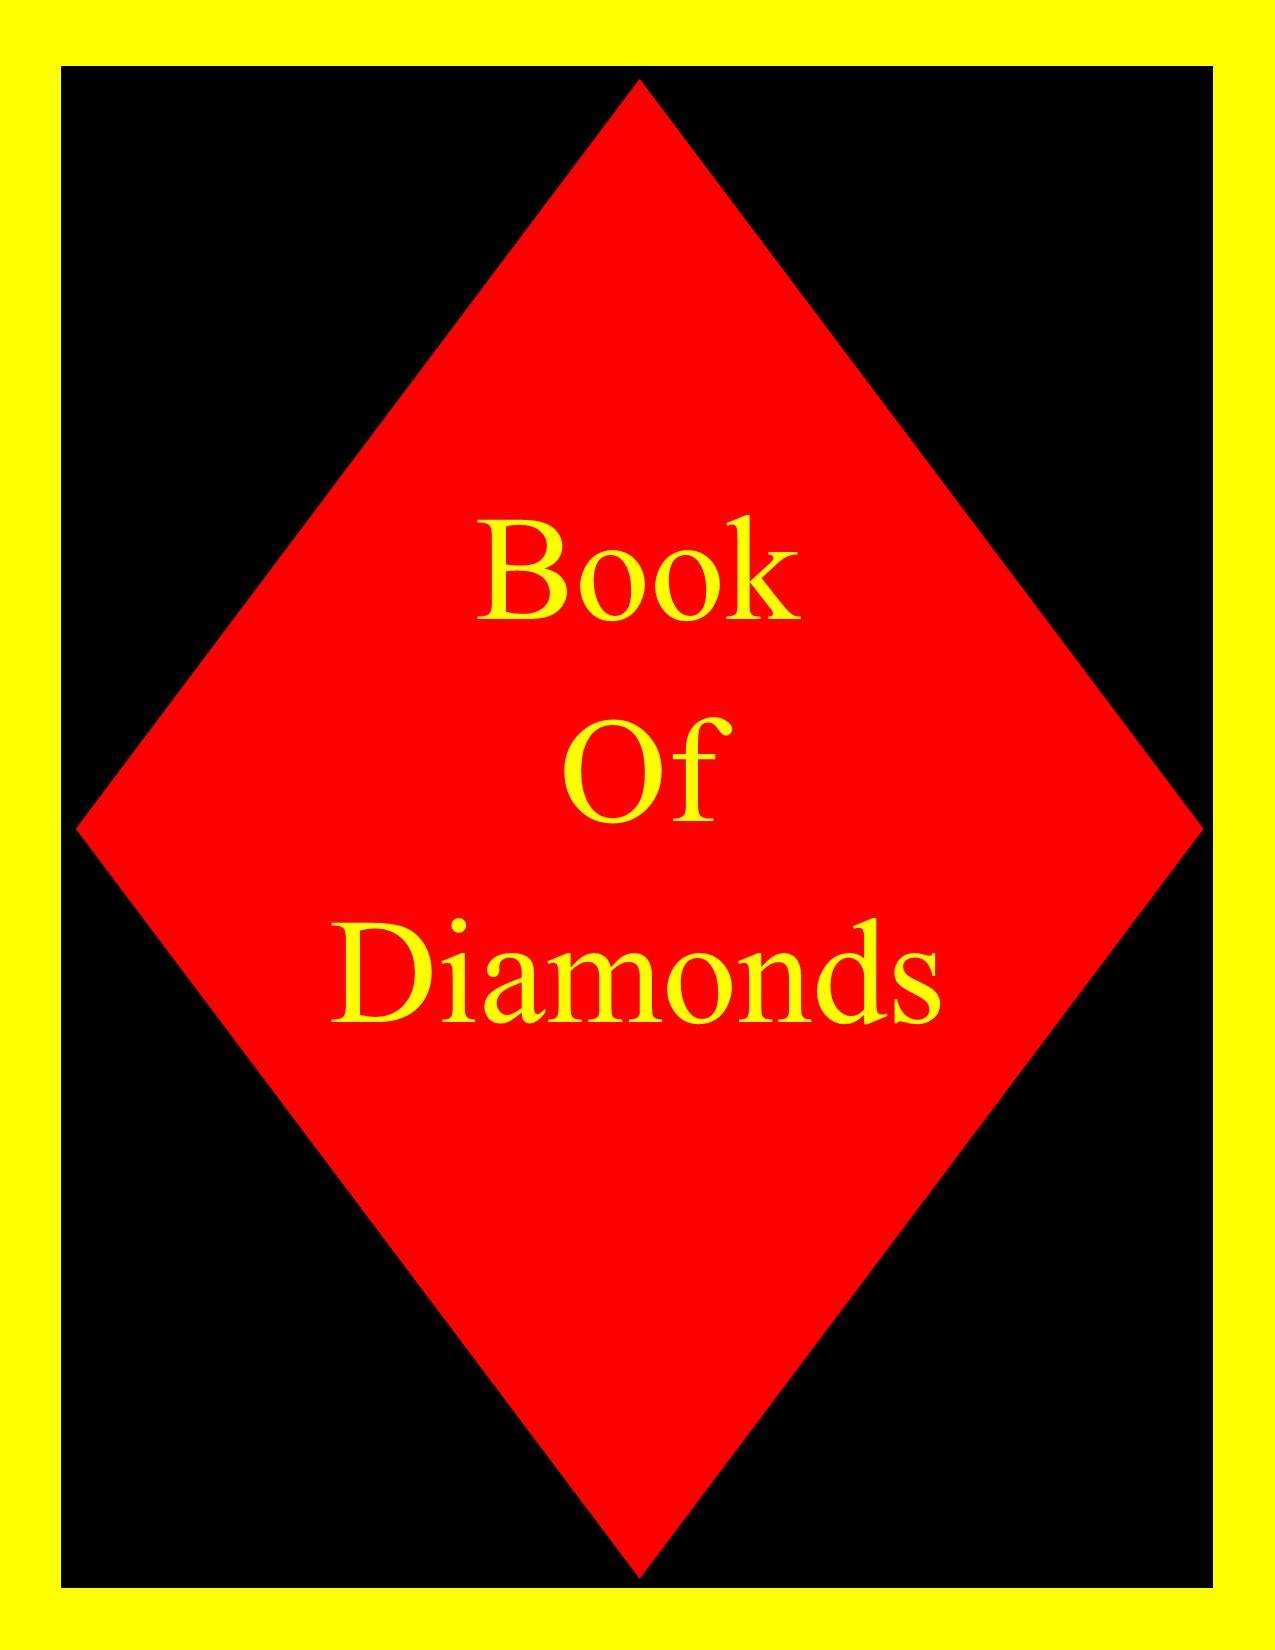 Book Of Diamonds Cover Final